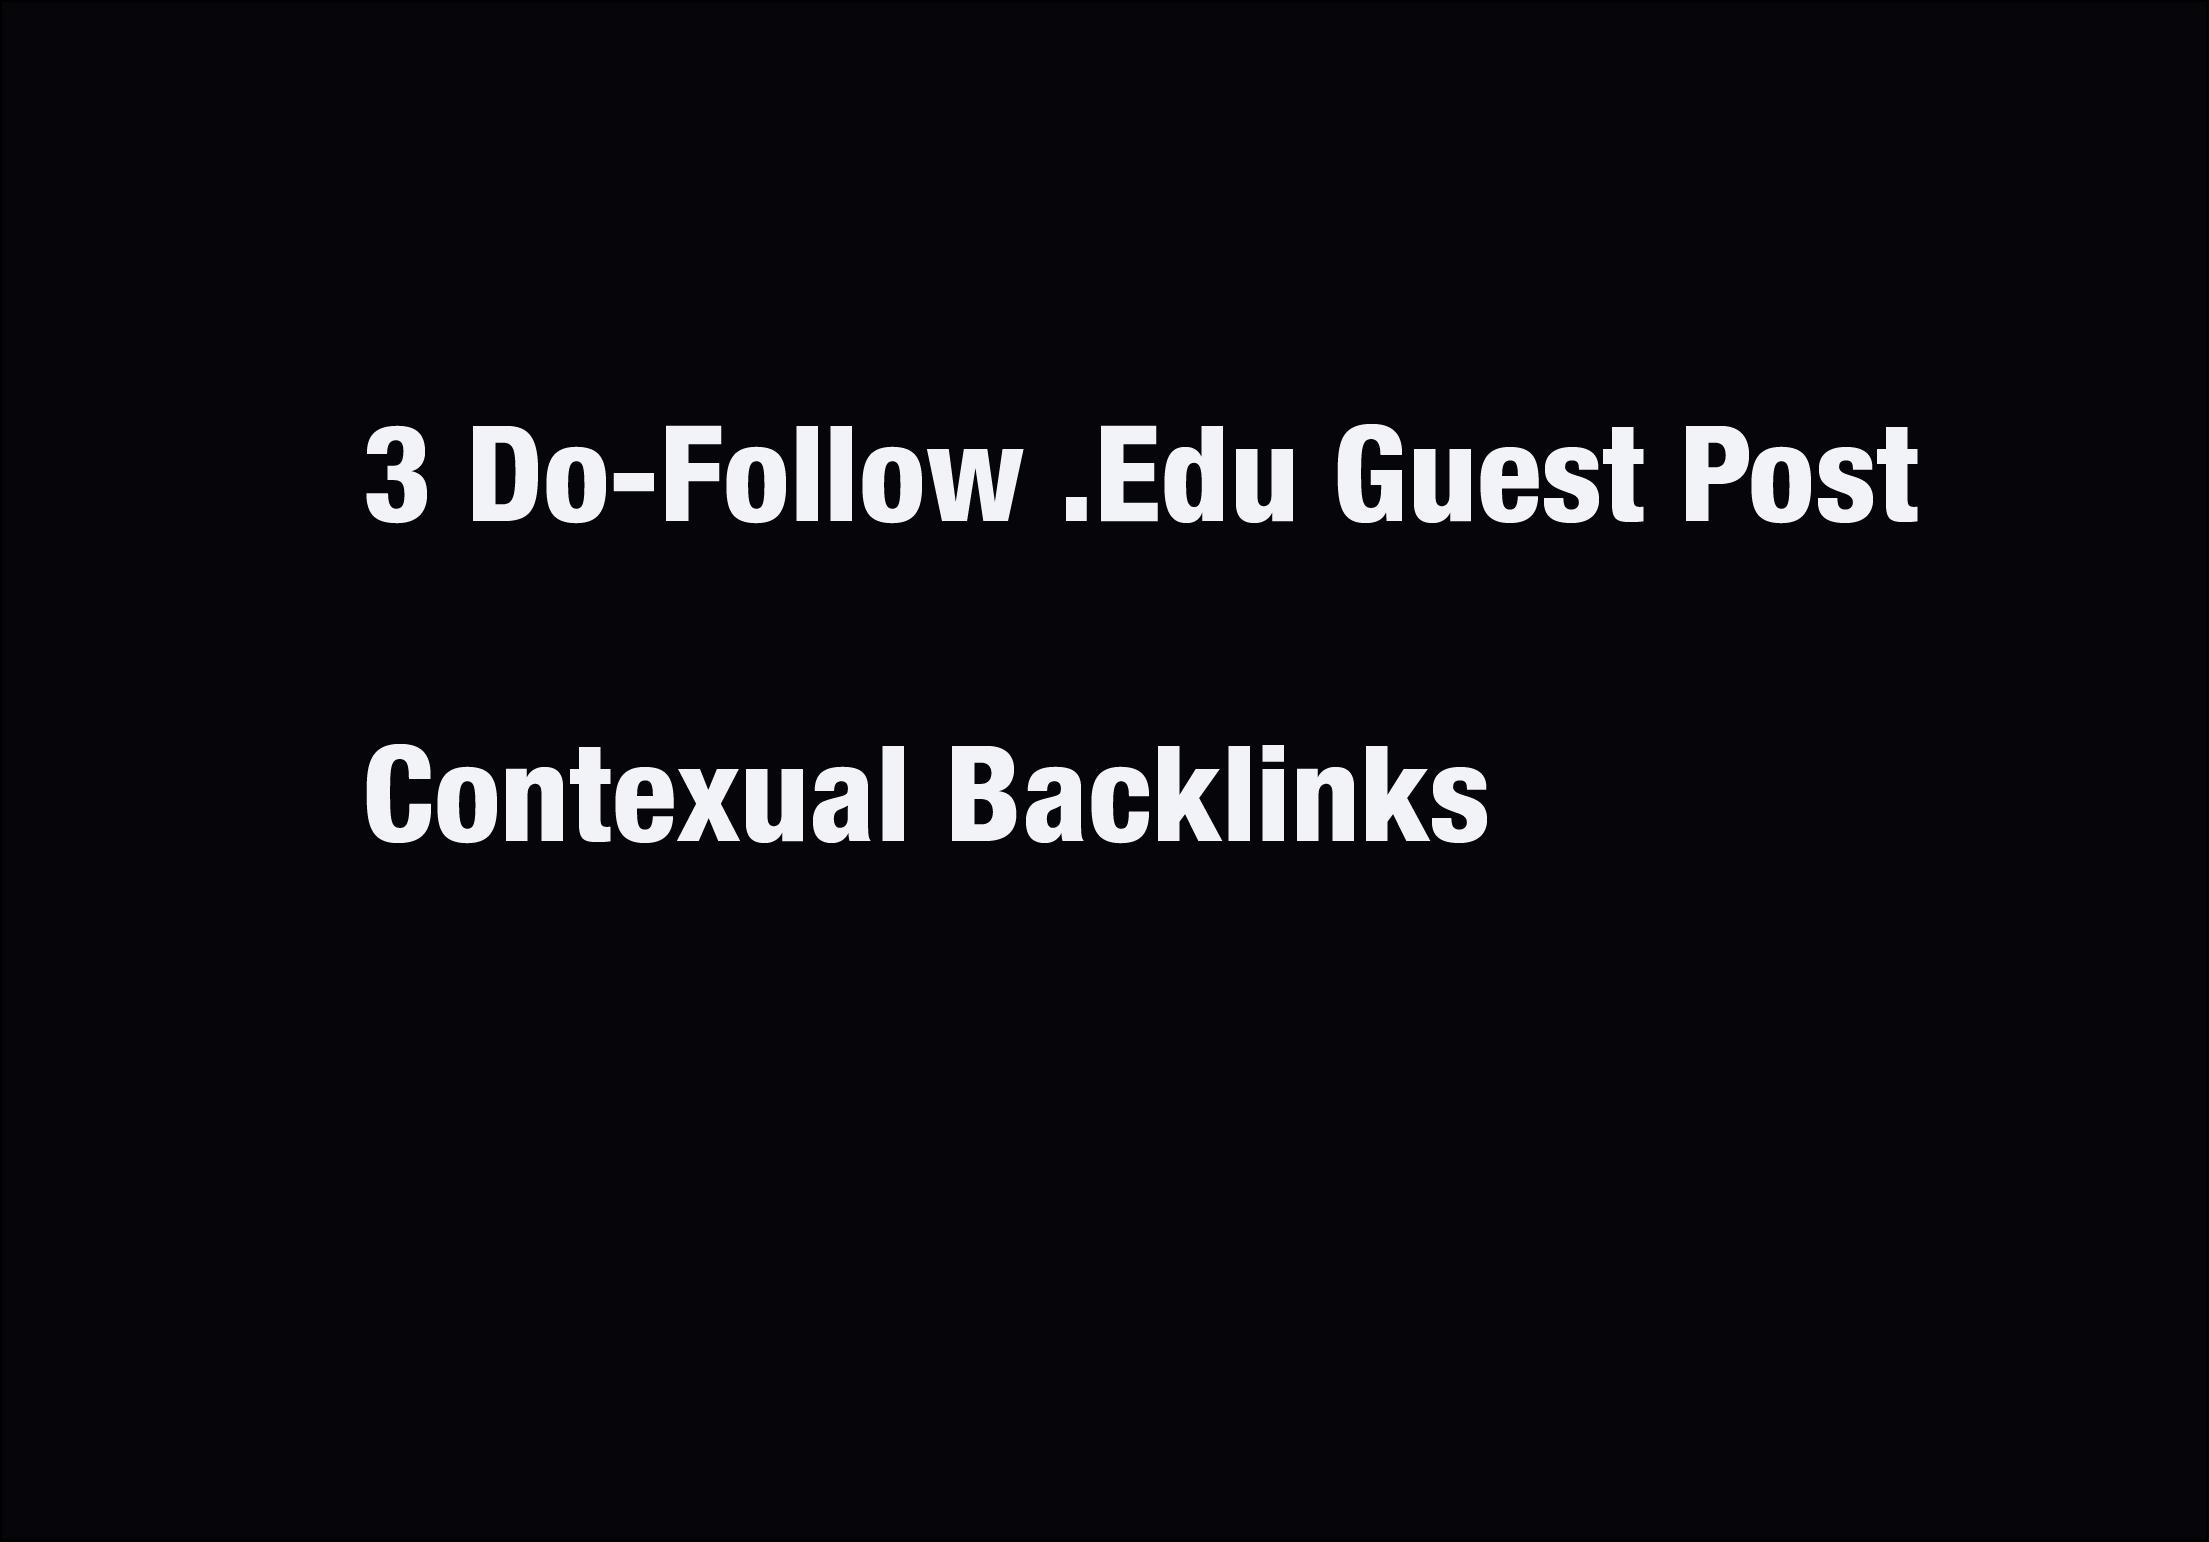 3 Edu Guest Post Contextual Backlinks